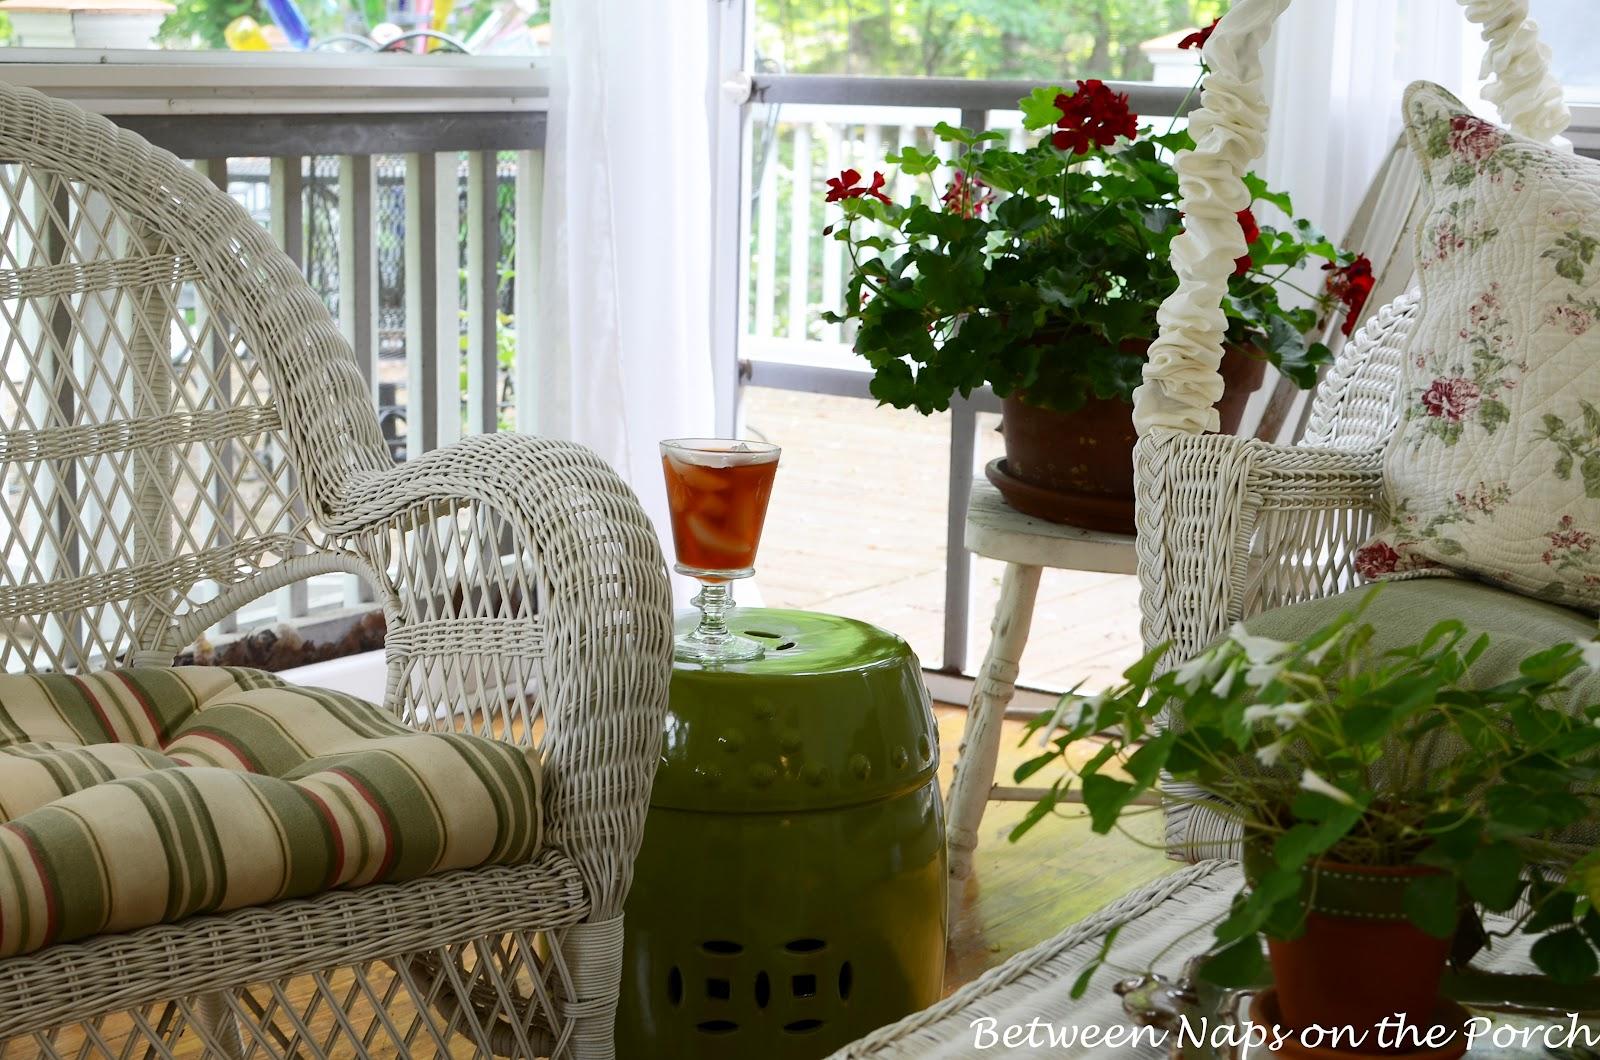 green garden seat garden stool